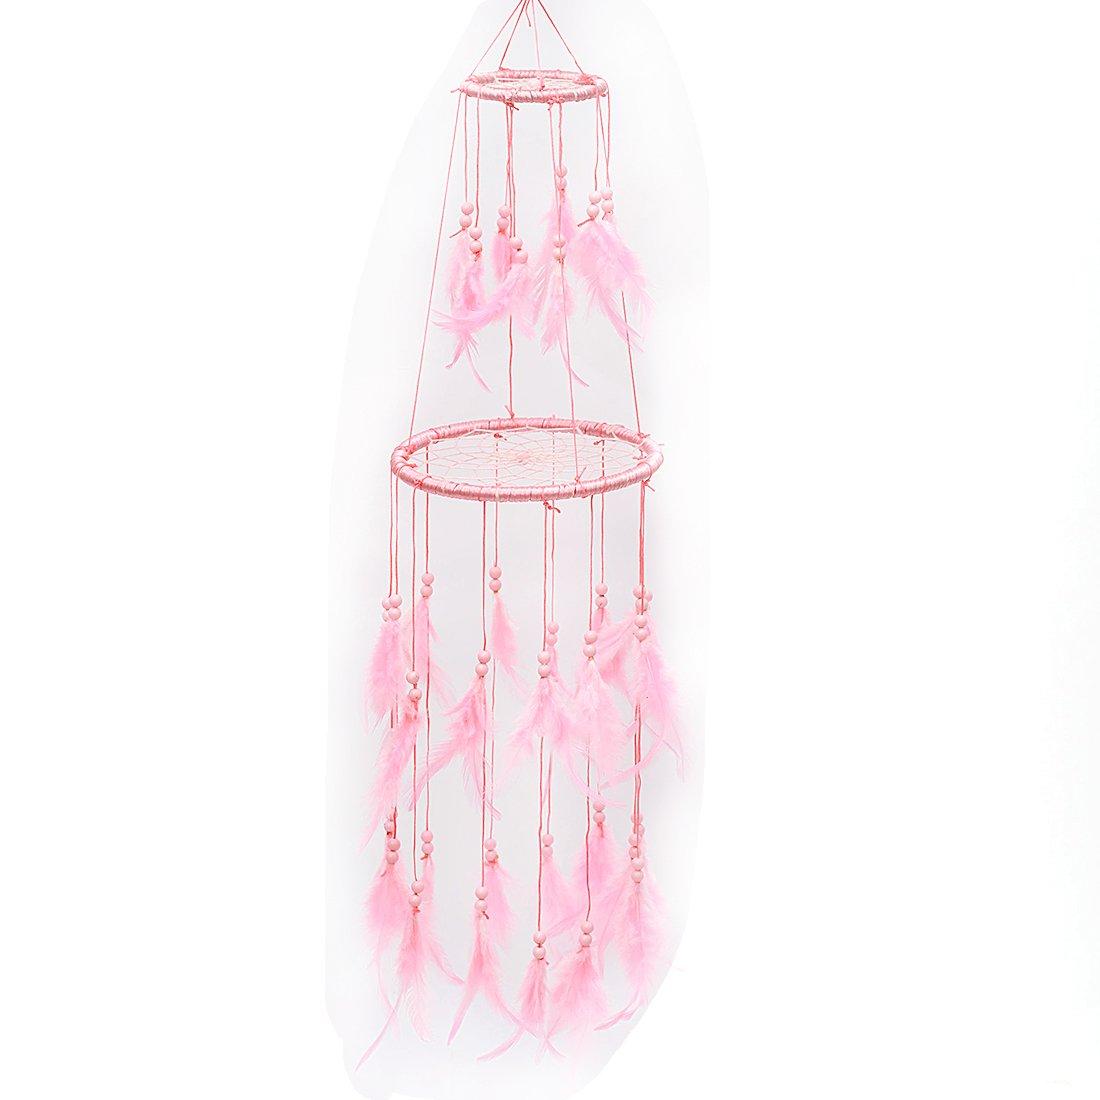 Probeauty Blush Pink Floral Dream Catcher Mobile Blush Pink Flowers - Nursery Mobile Crib Mobile Cot Mobile Feather Mobile Boho Dream Catcher Boho (Pink)